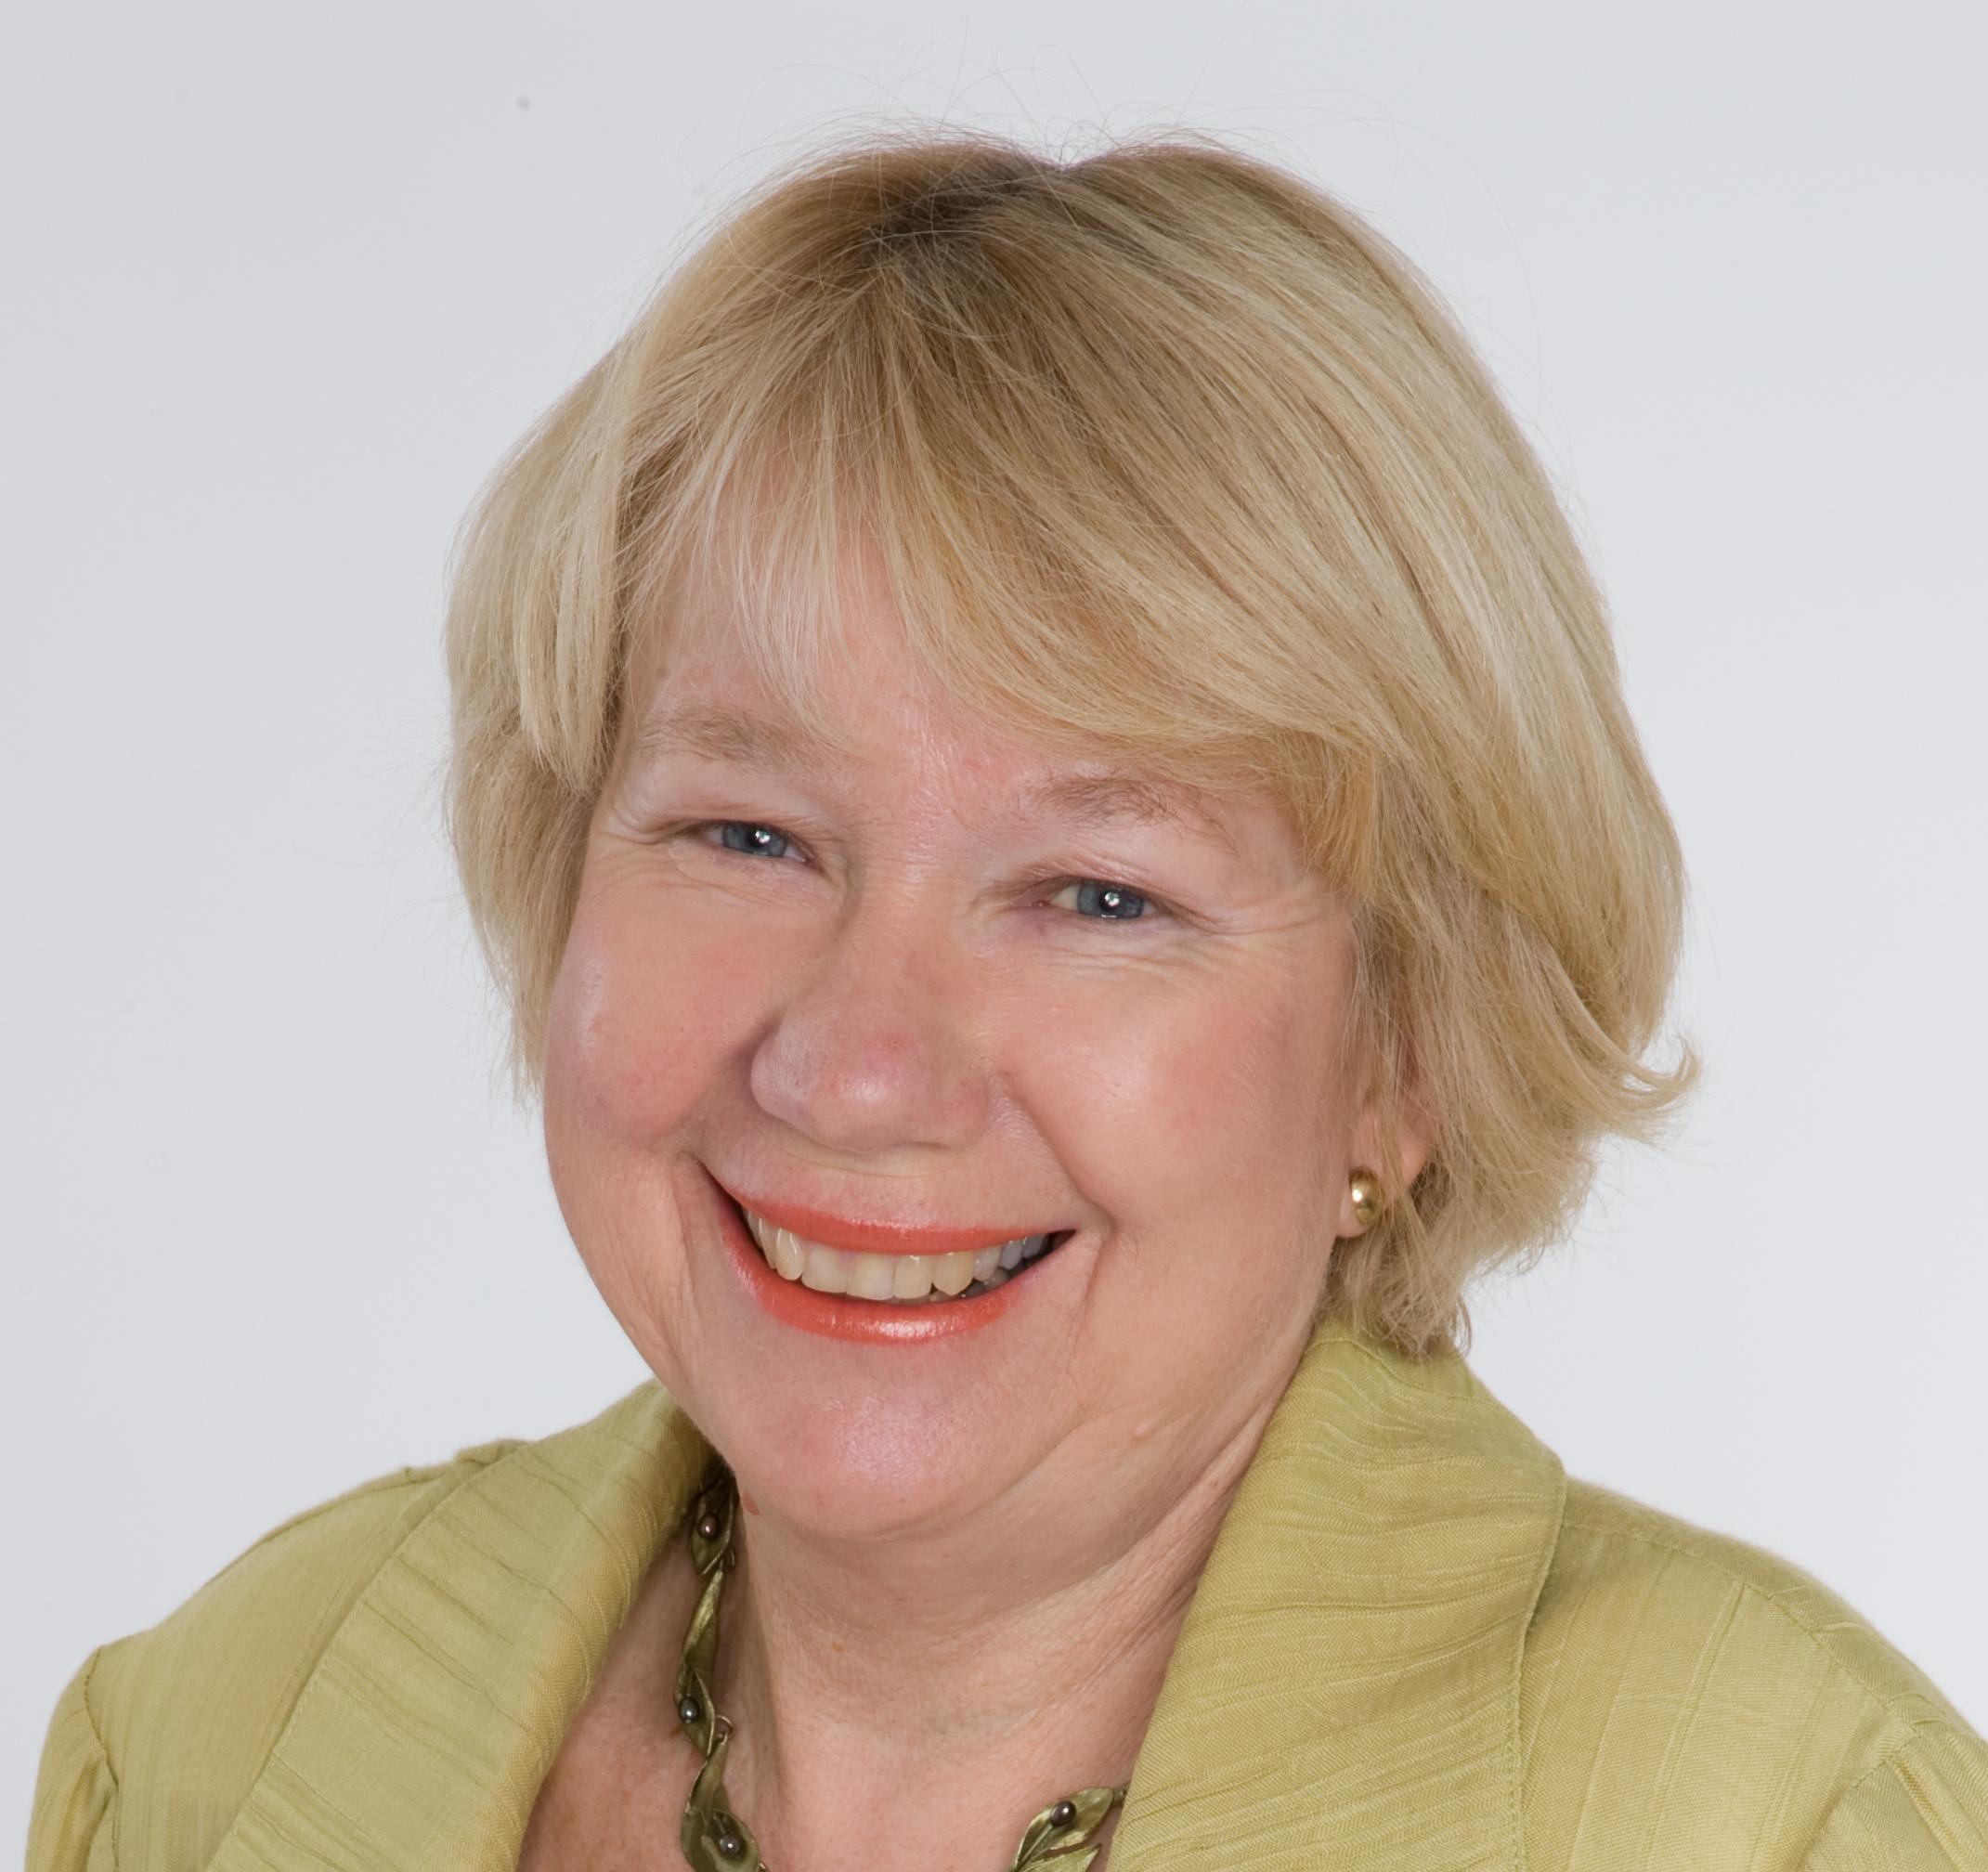 Lesley McCowan